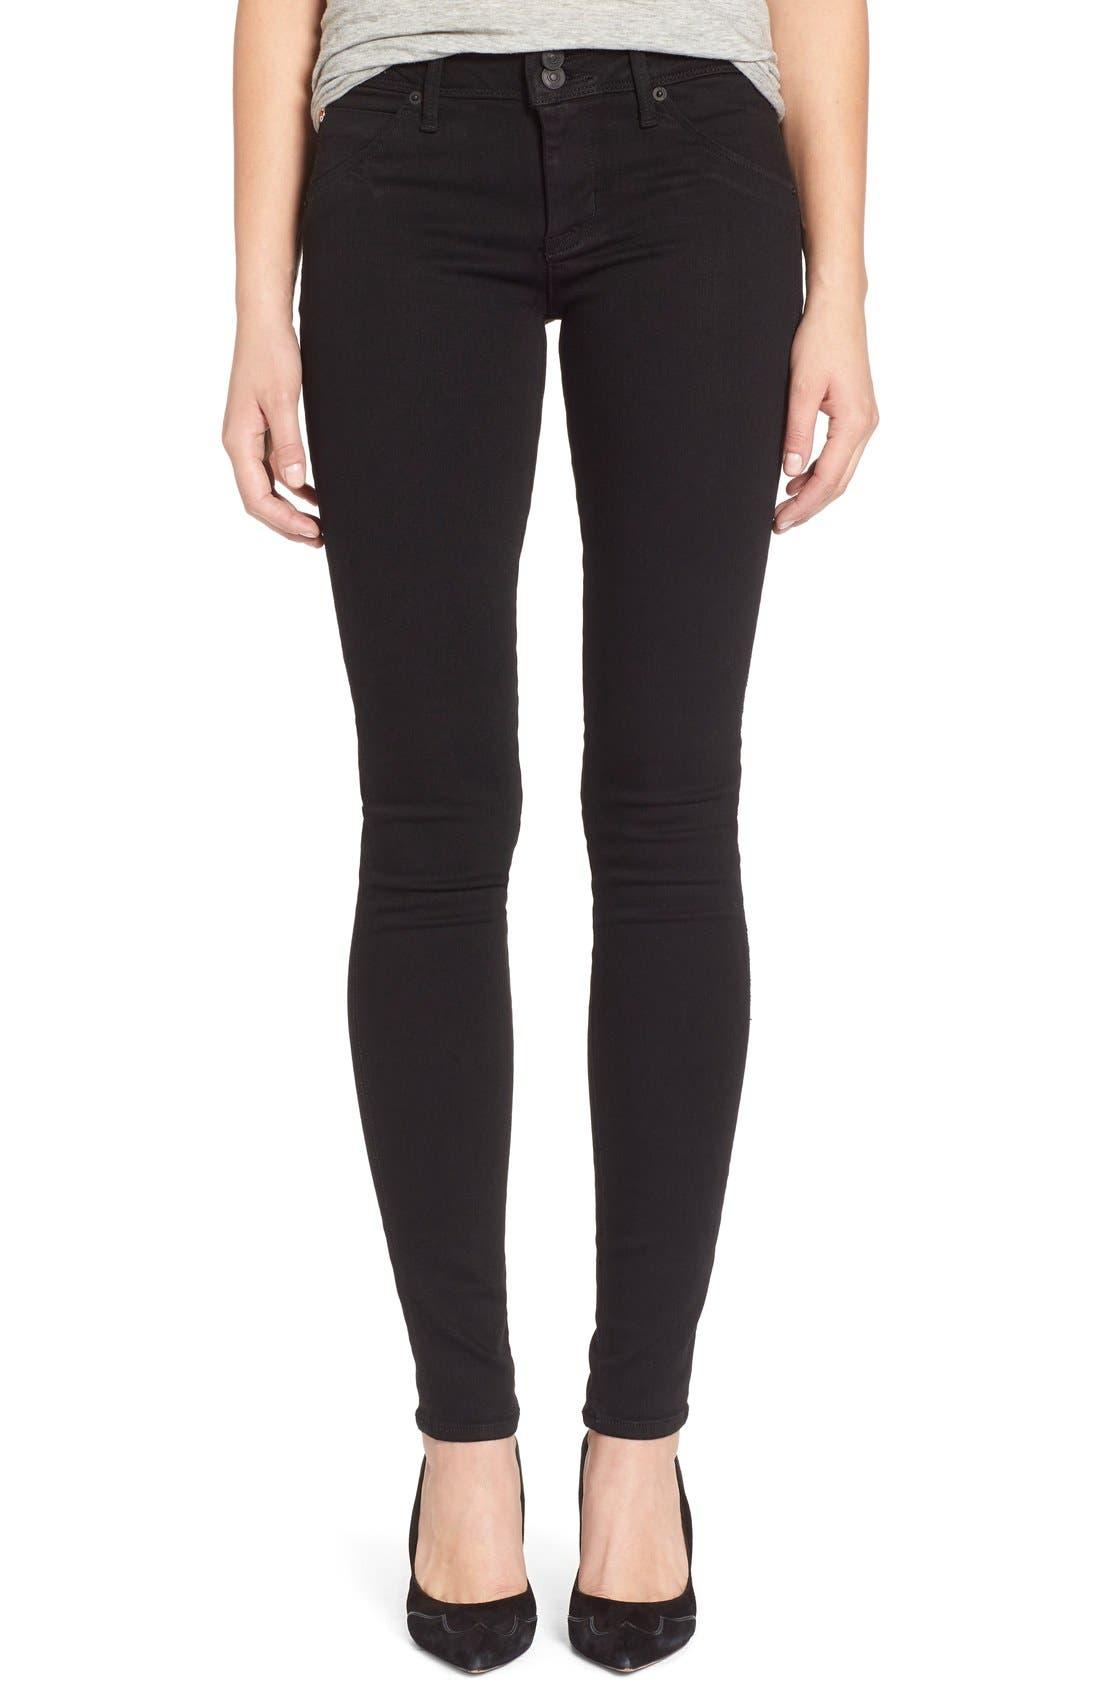 'Collin' Supermodel Skinny Jeans,                         Main,                         color, Black